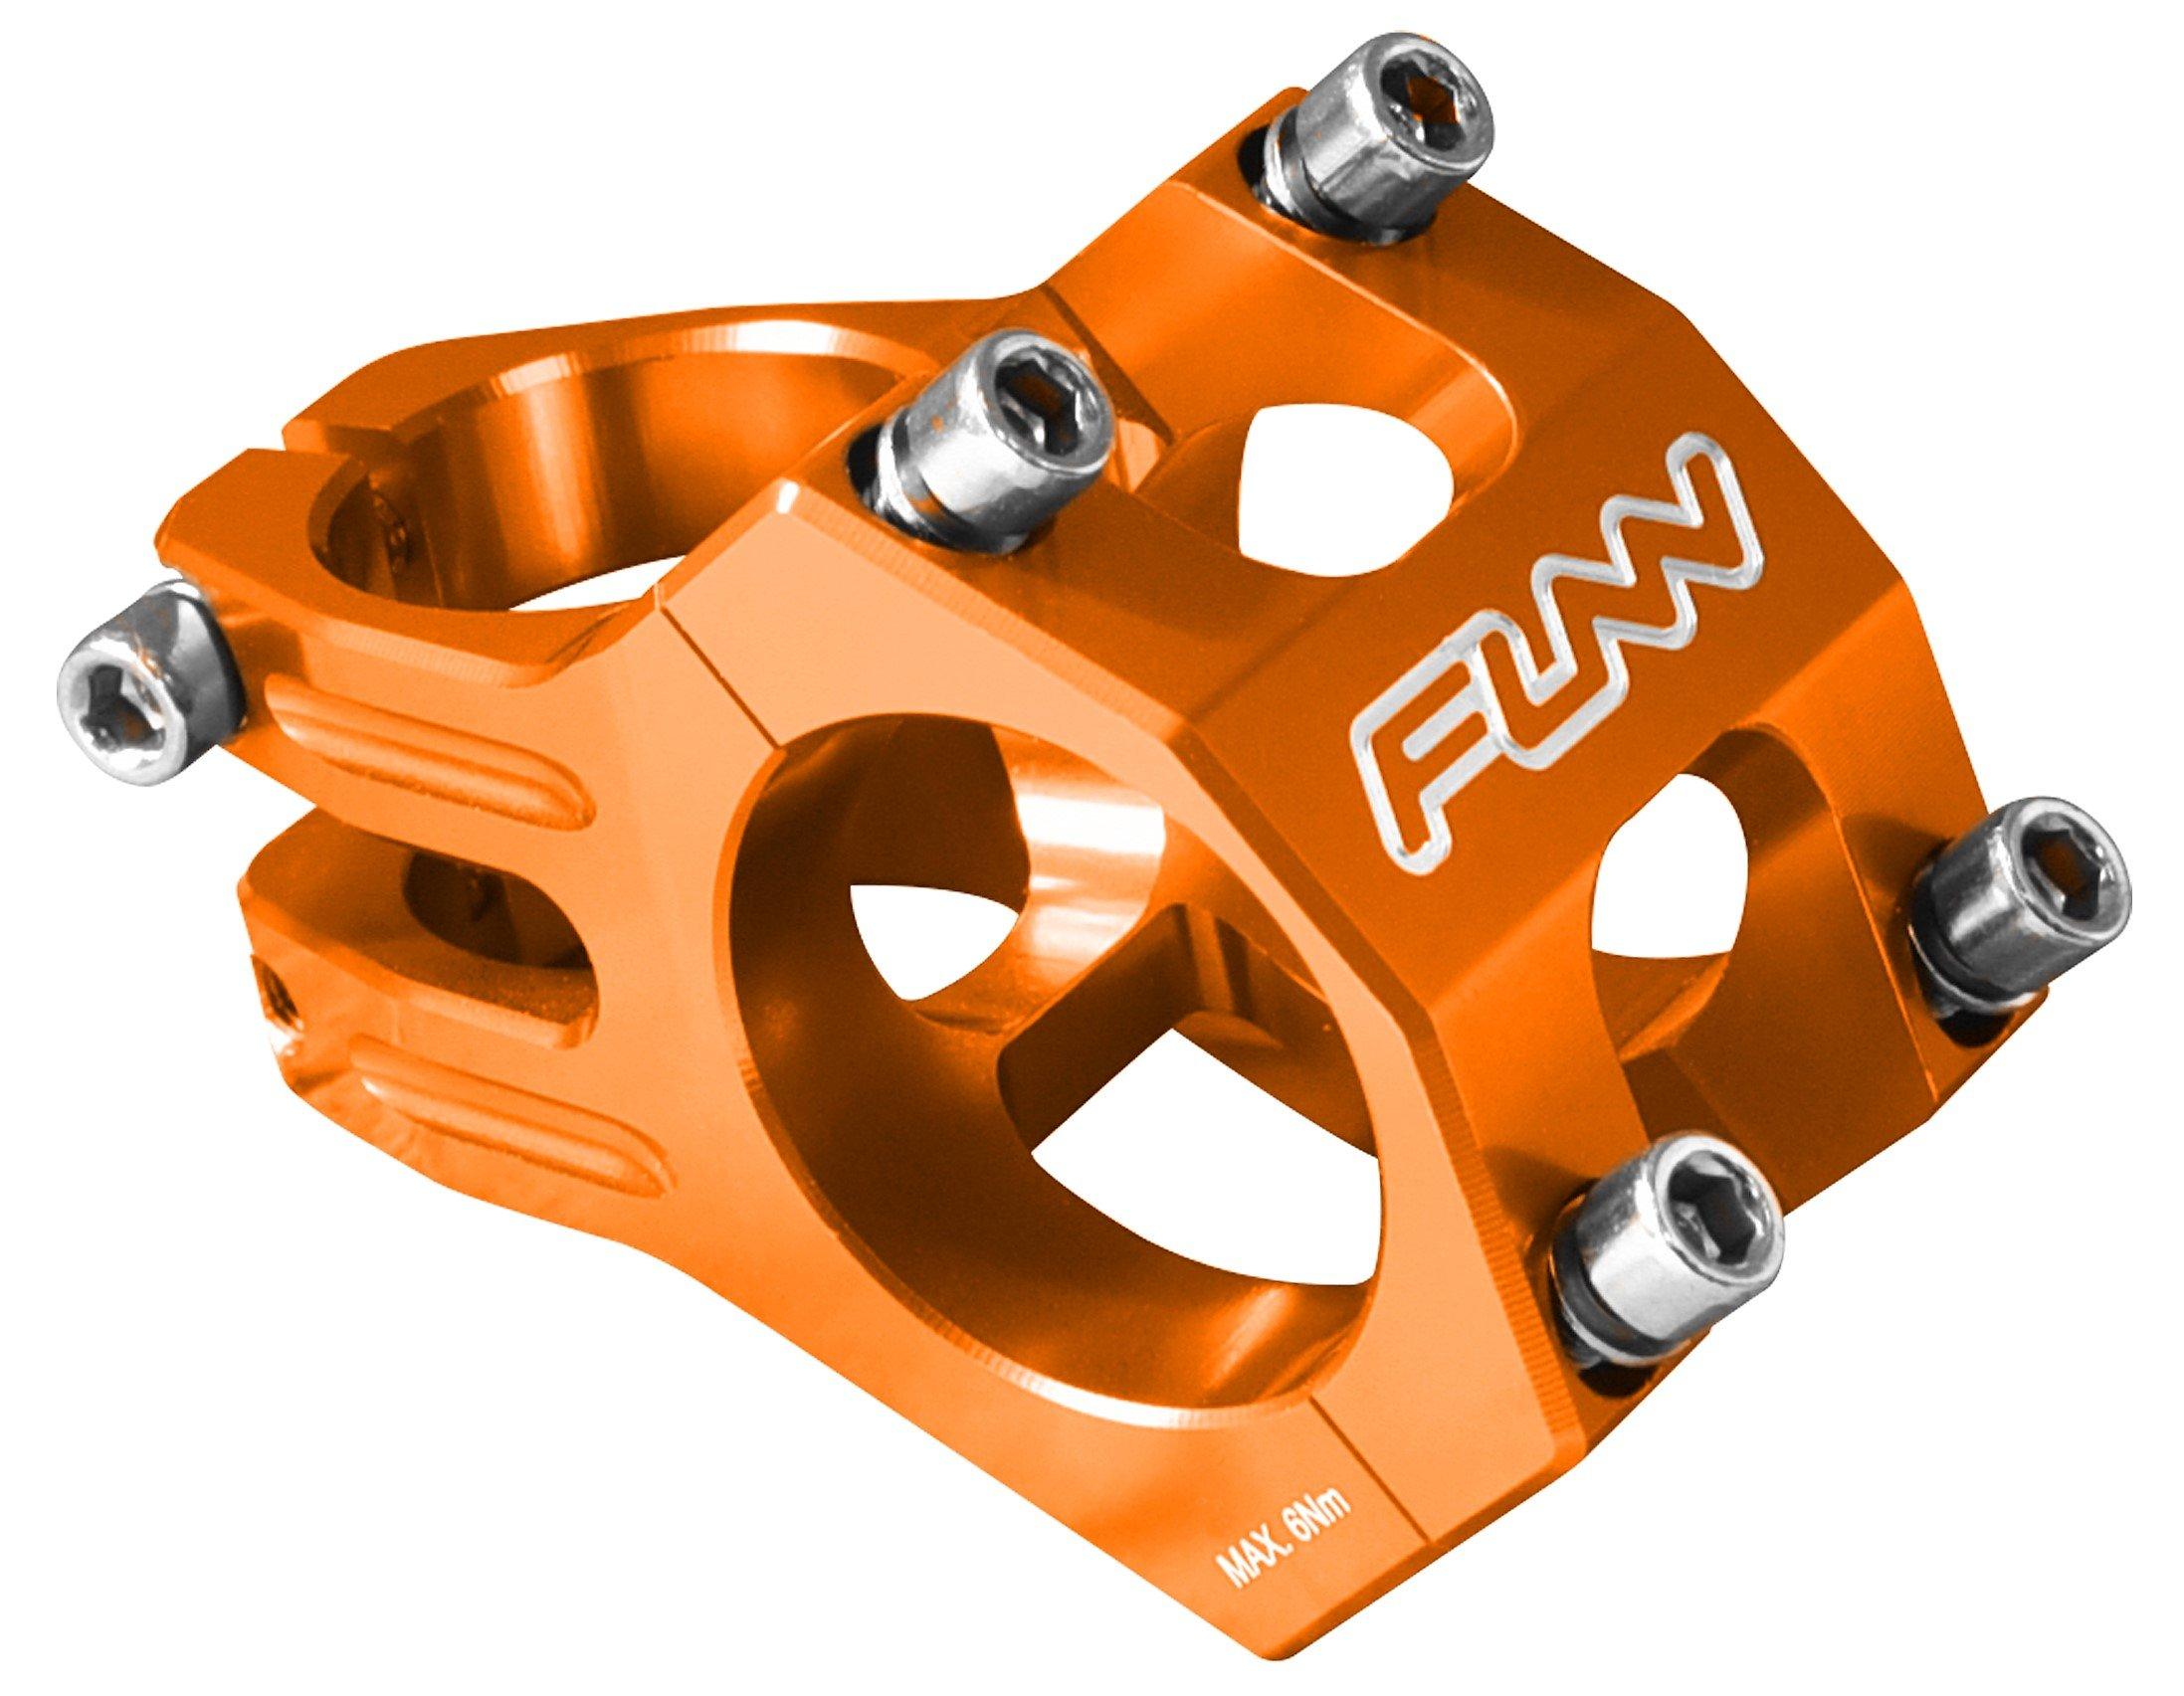 Funn Funnduro MTB Stem, Bar Clamp 31.8mm (Length 35mm, Orange) by Funn